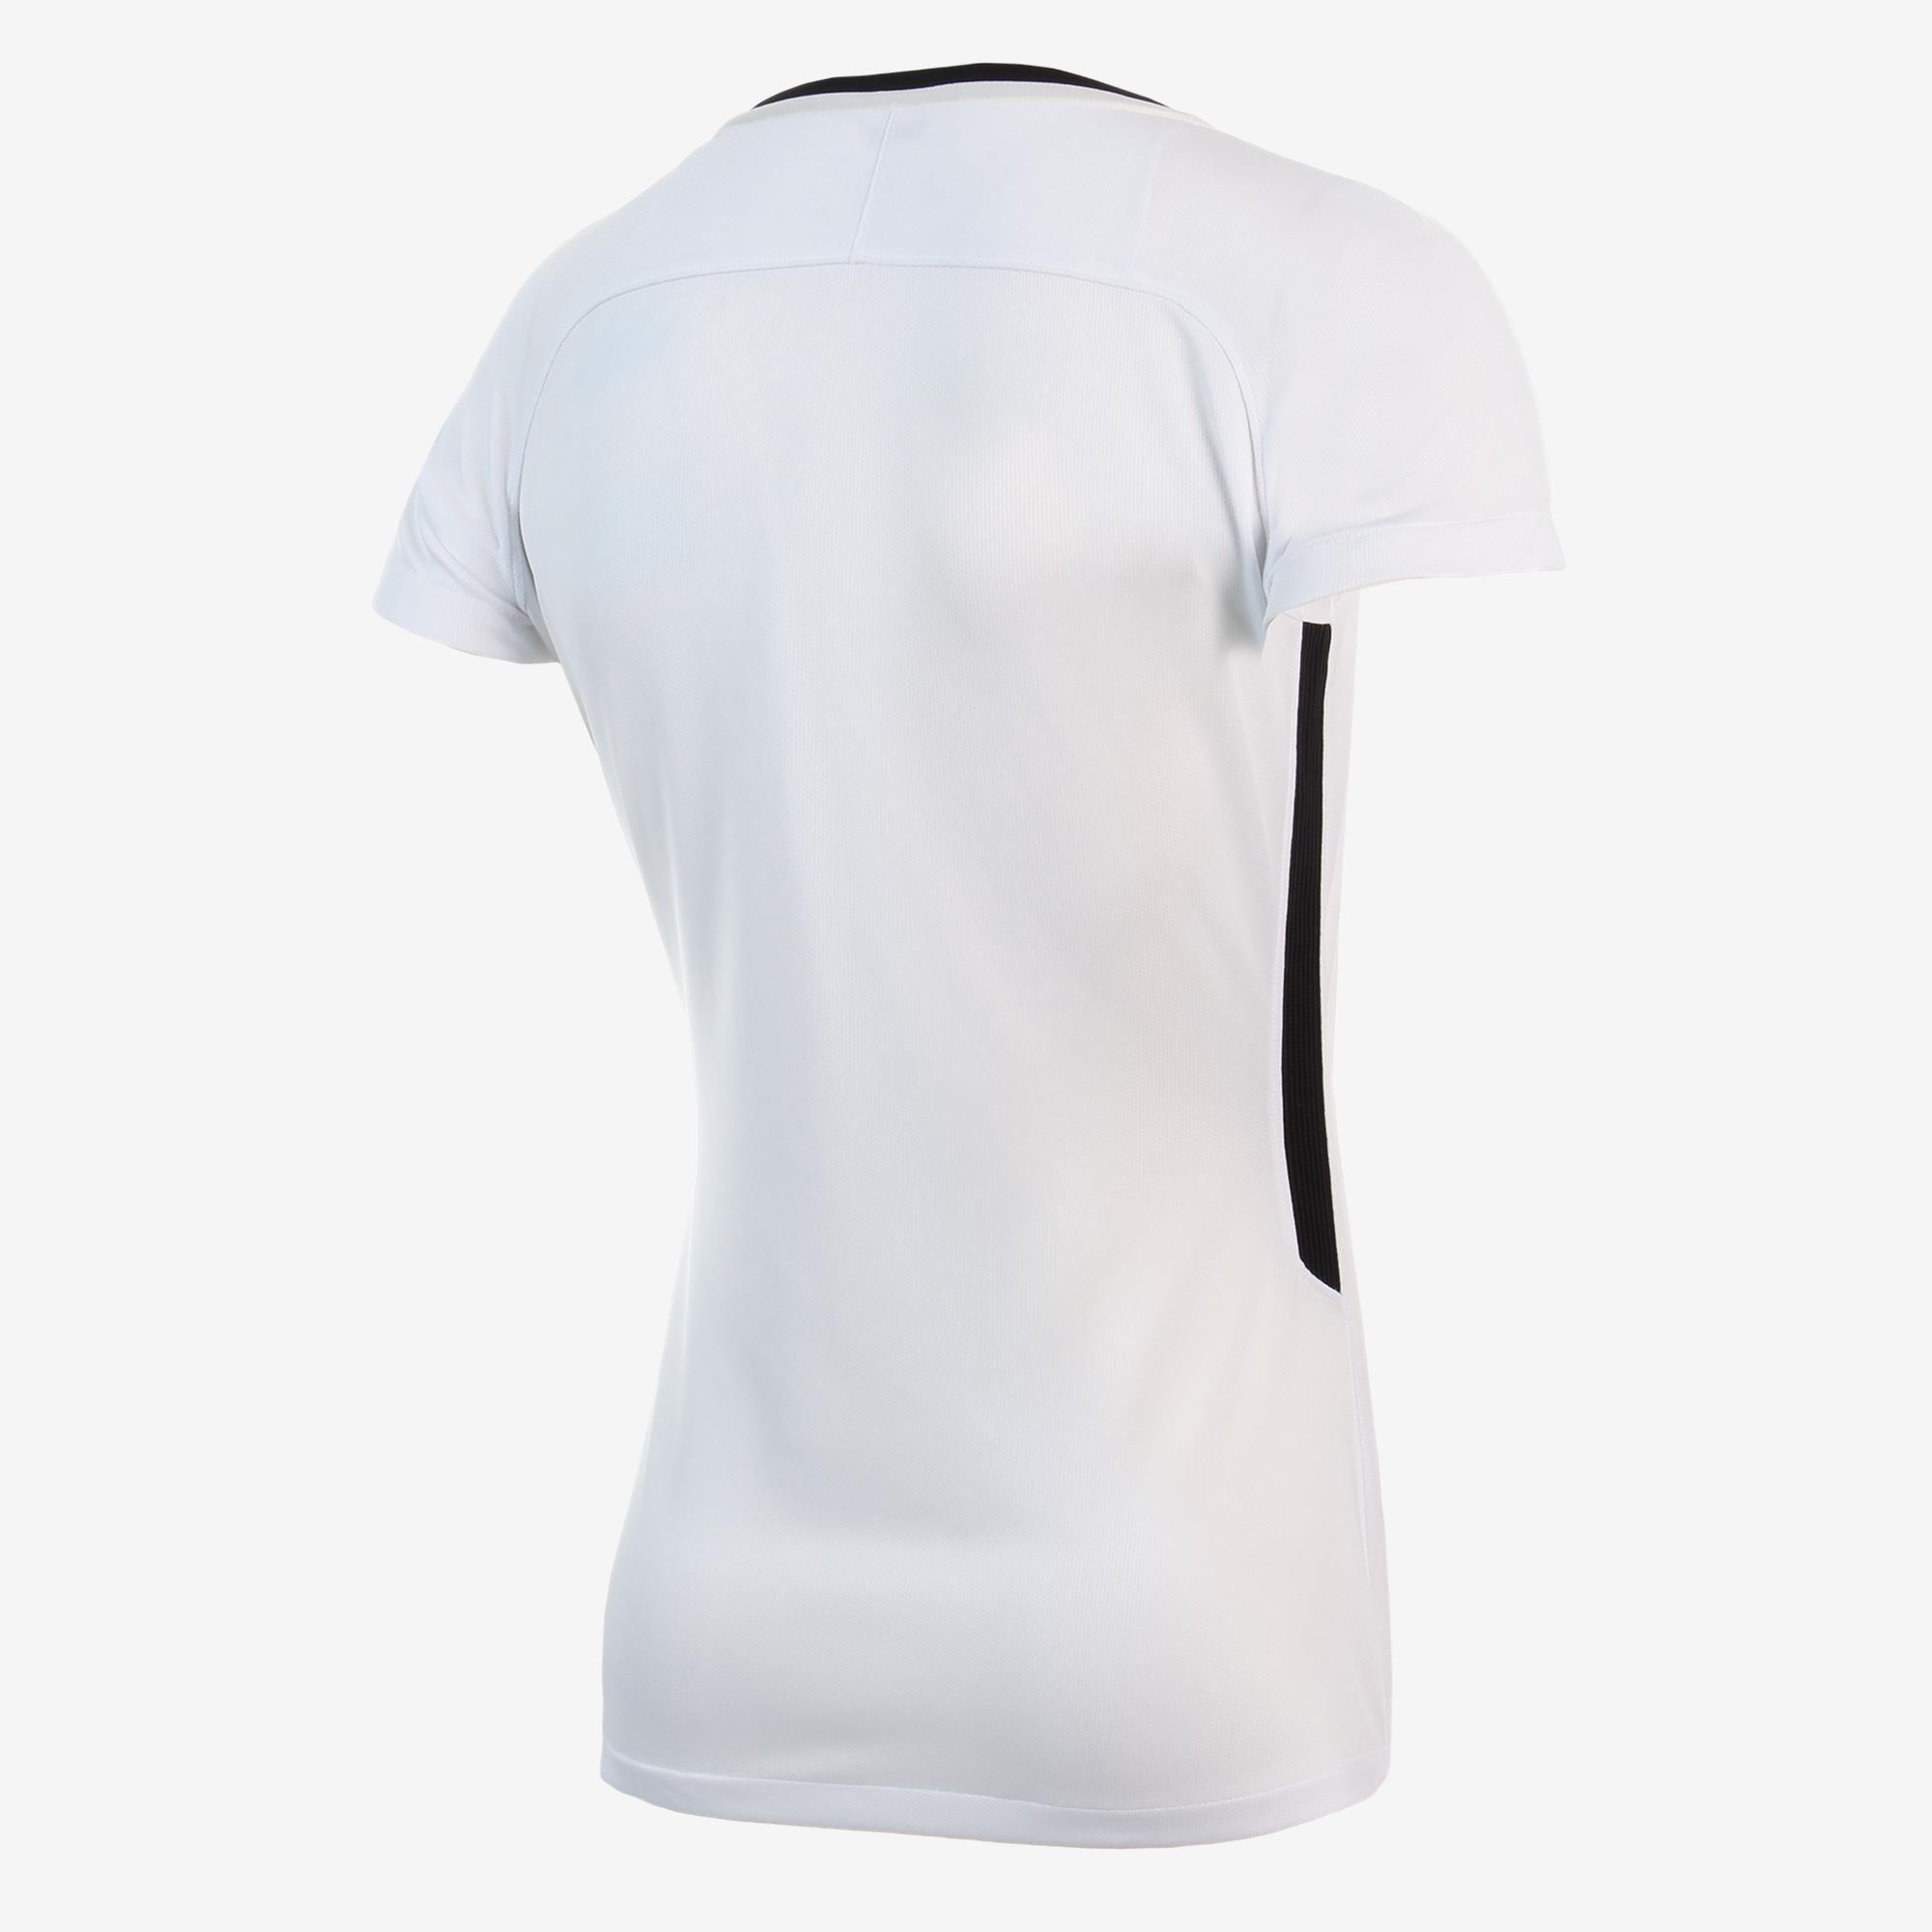 7c4ef1f7c00b3 ... Camiseta Feminina Corinthians i 17 18 S nº Dri-fit Torcedor Oficial ...